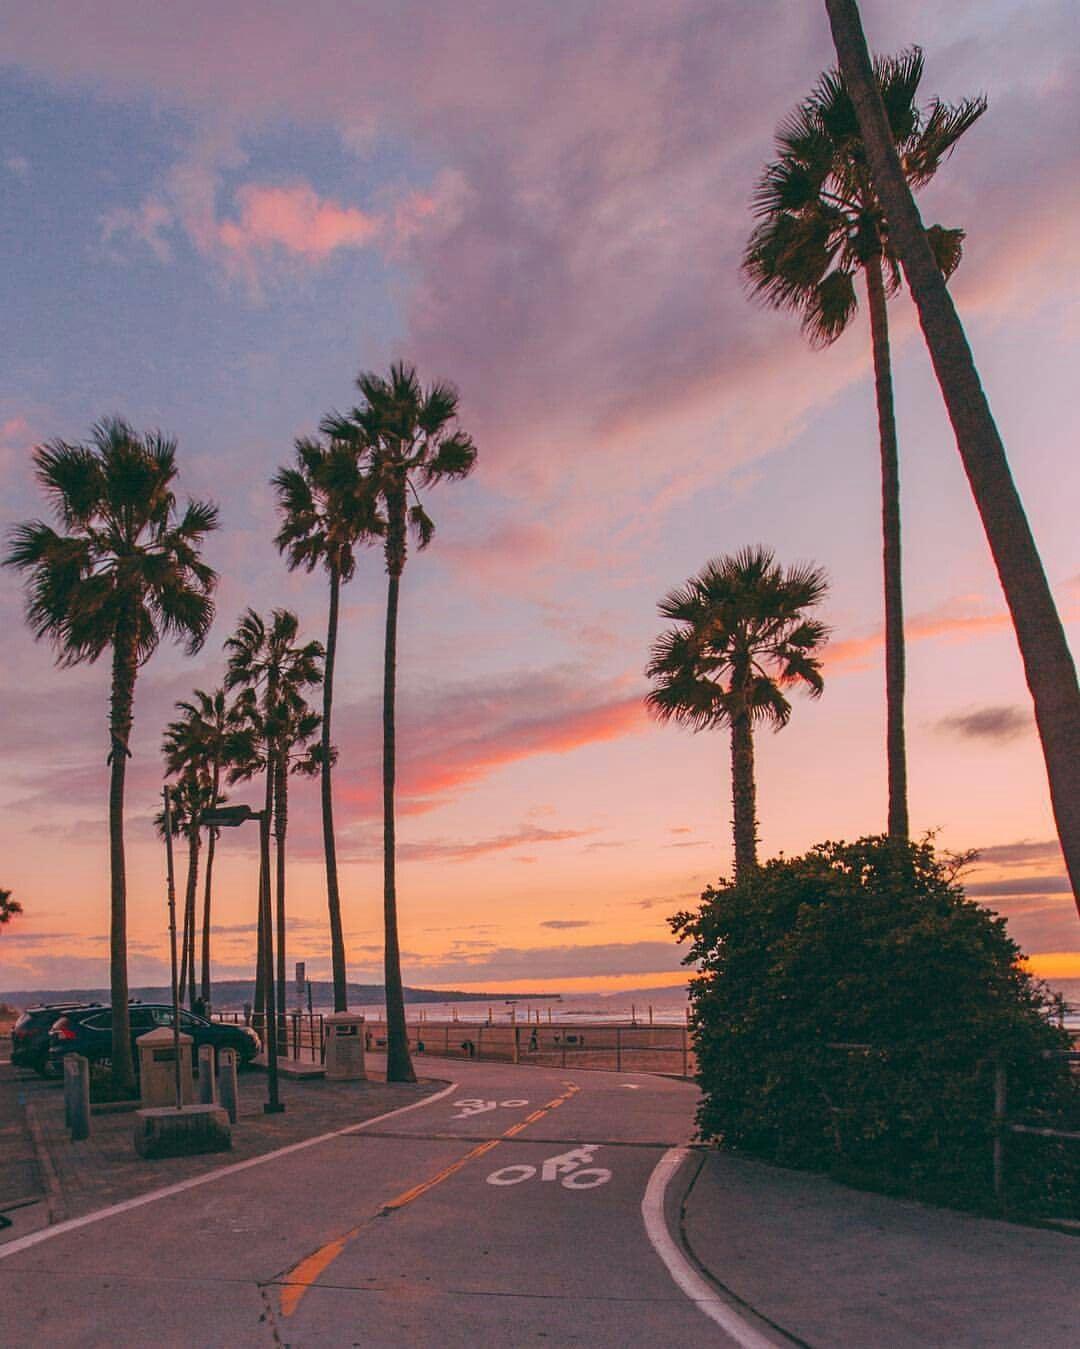 𝒑𝒊𝒏𝒕𝒆𝒓𝒆𝒔𝒕 𝒏𝒐𝒉𝒓𝒔𝒉𝒊𝒅𝒐 Sky Aesthetic Sunset Wallpaper Iphone Wallpaper Images